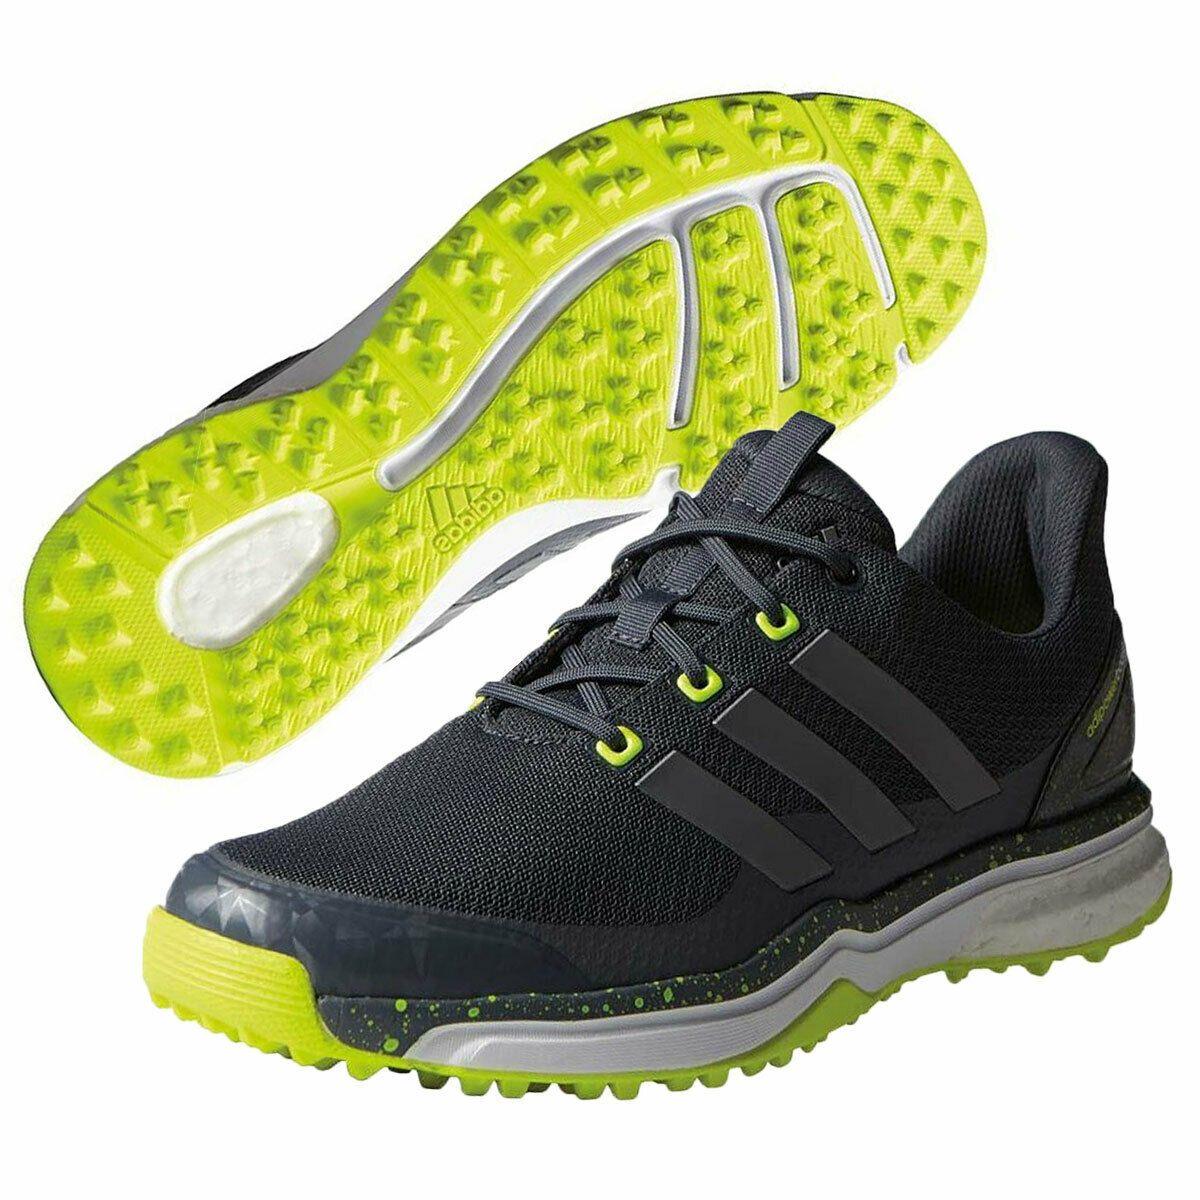 blanco lechoso Énfasis Optimismo  adidas Golf Mens Adipower Sport Boost 2 Waterproof Golf Shoes 52% OFF RRP |  Golf outfit, Adidas golf, Waterproof golf shoes